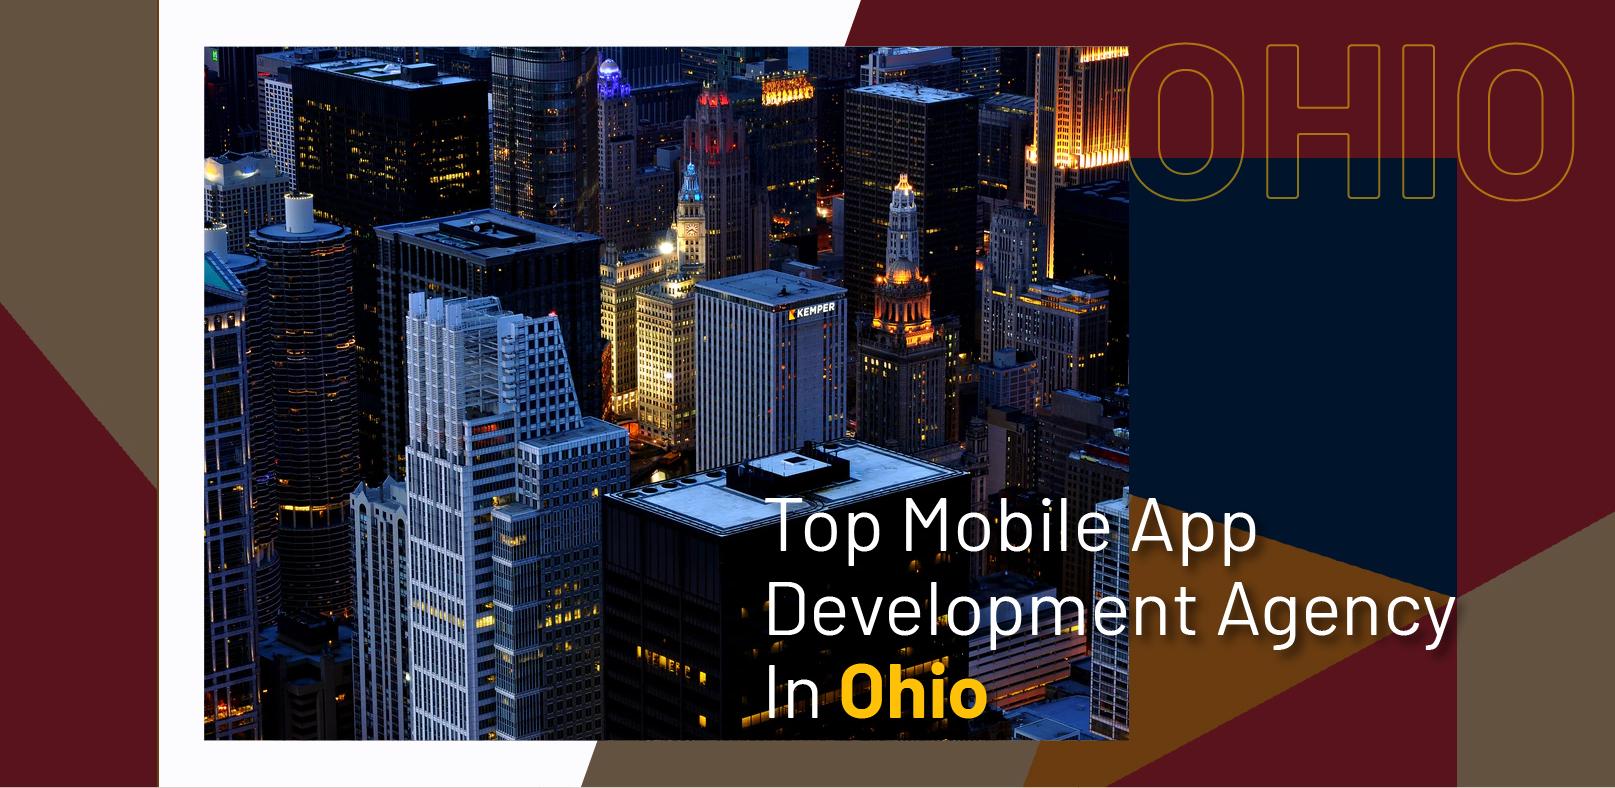 Top Mobile App Development Agency In Ohio - WebClues Infotech